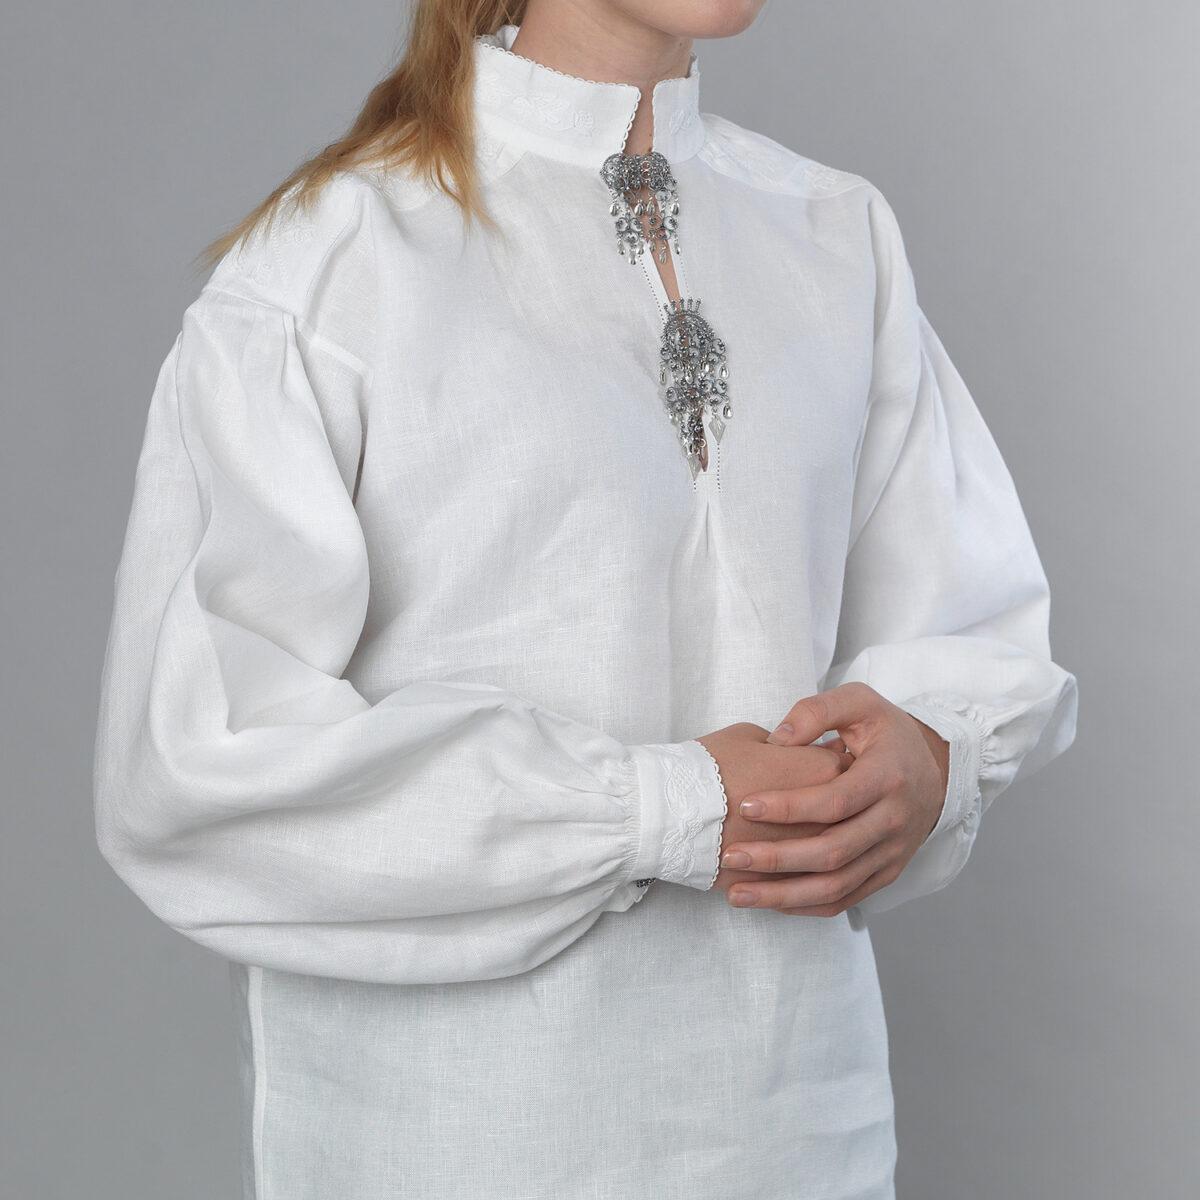 Gudbrandsdalen linskjorte -471